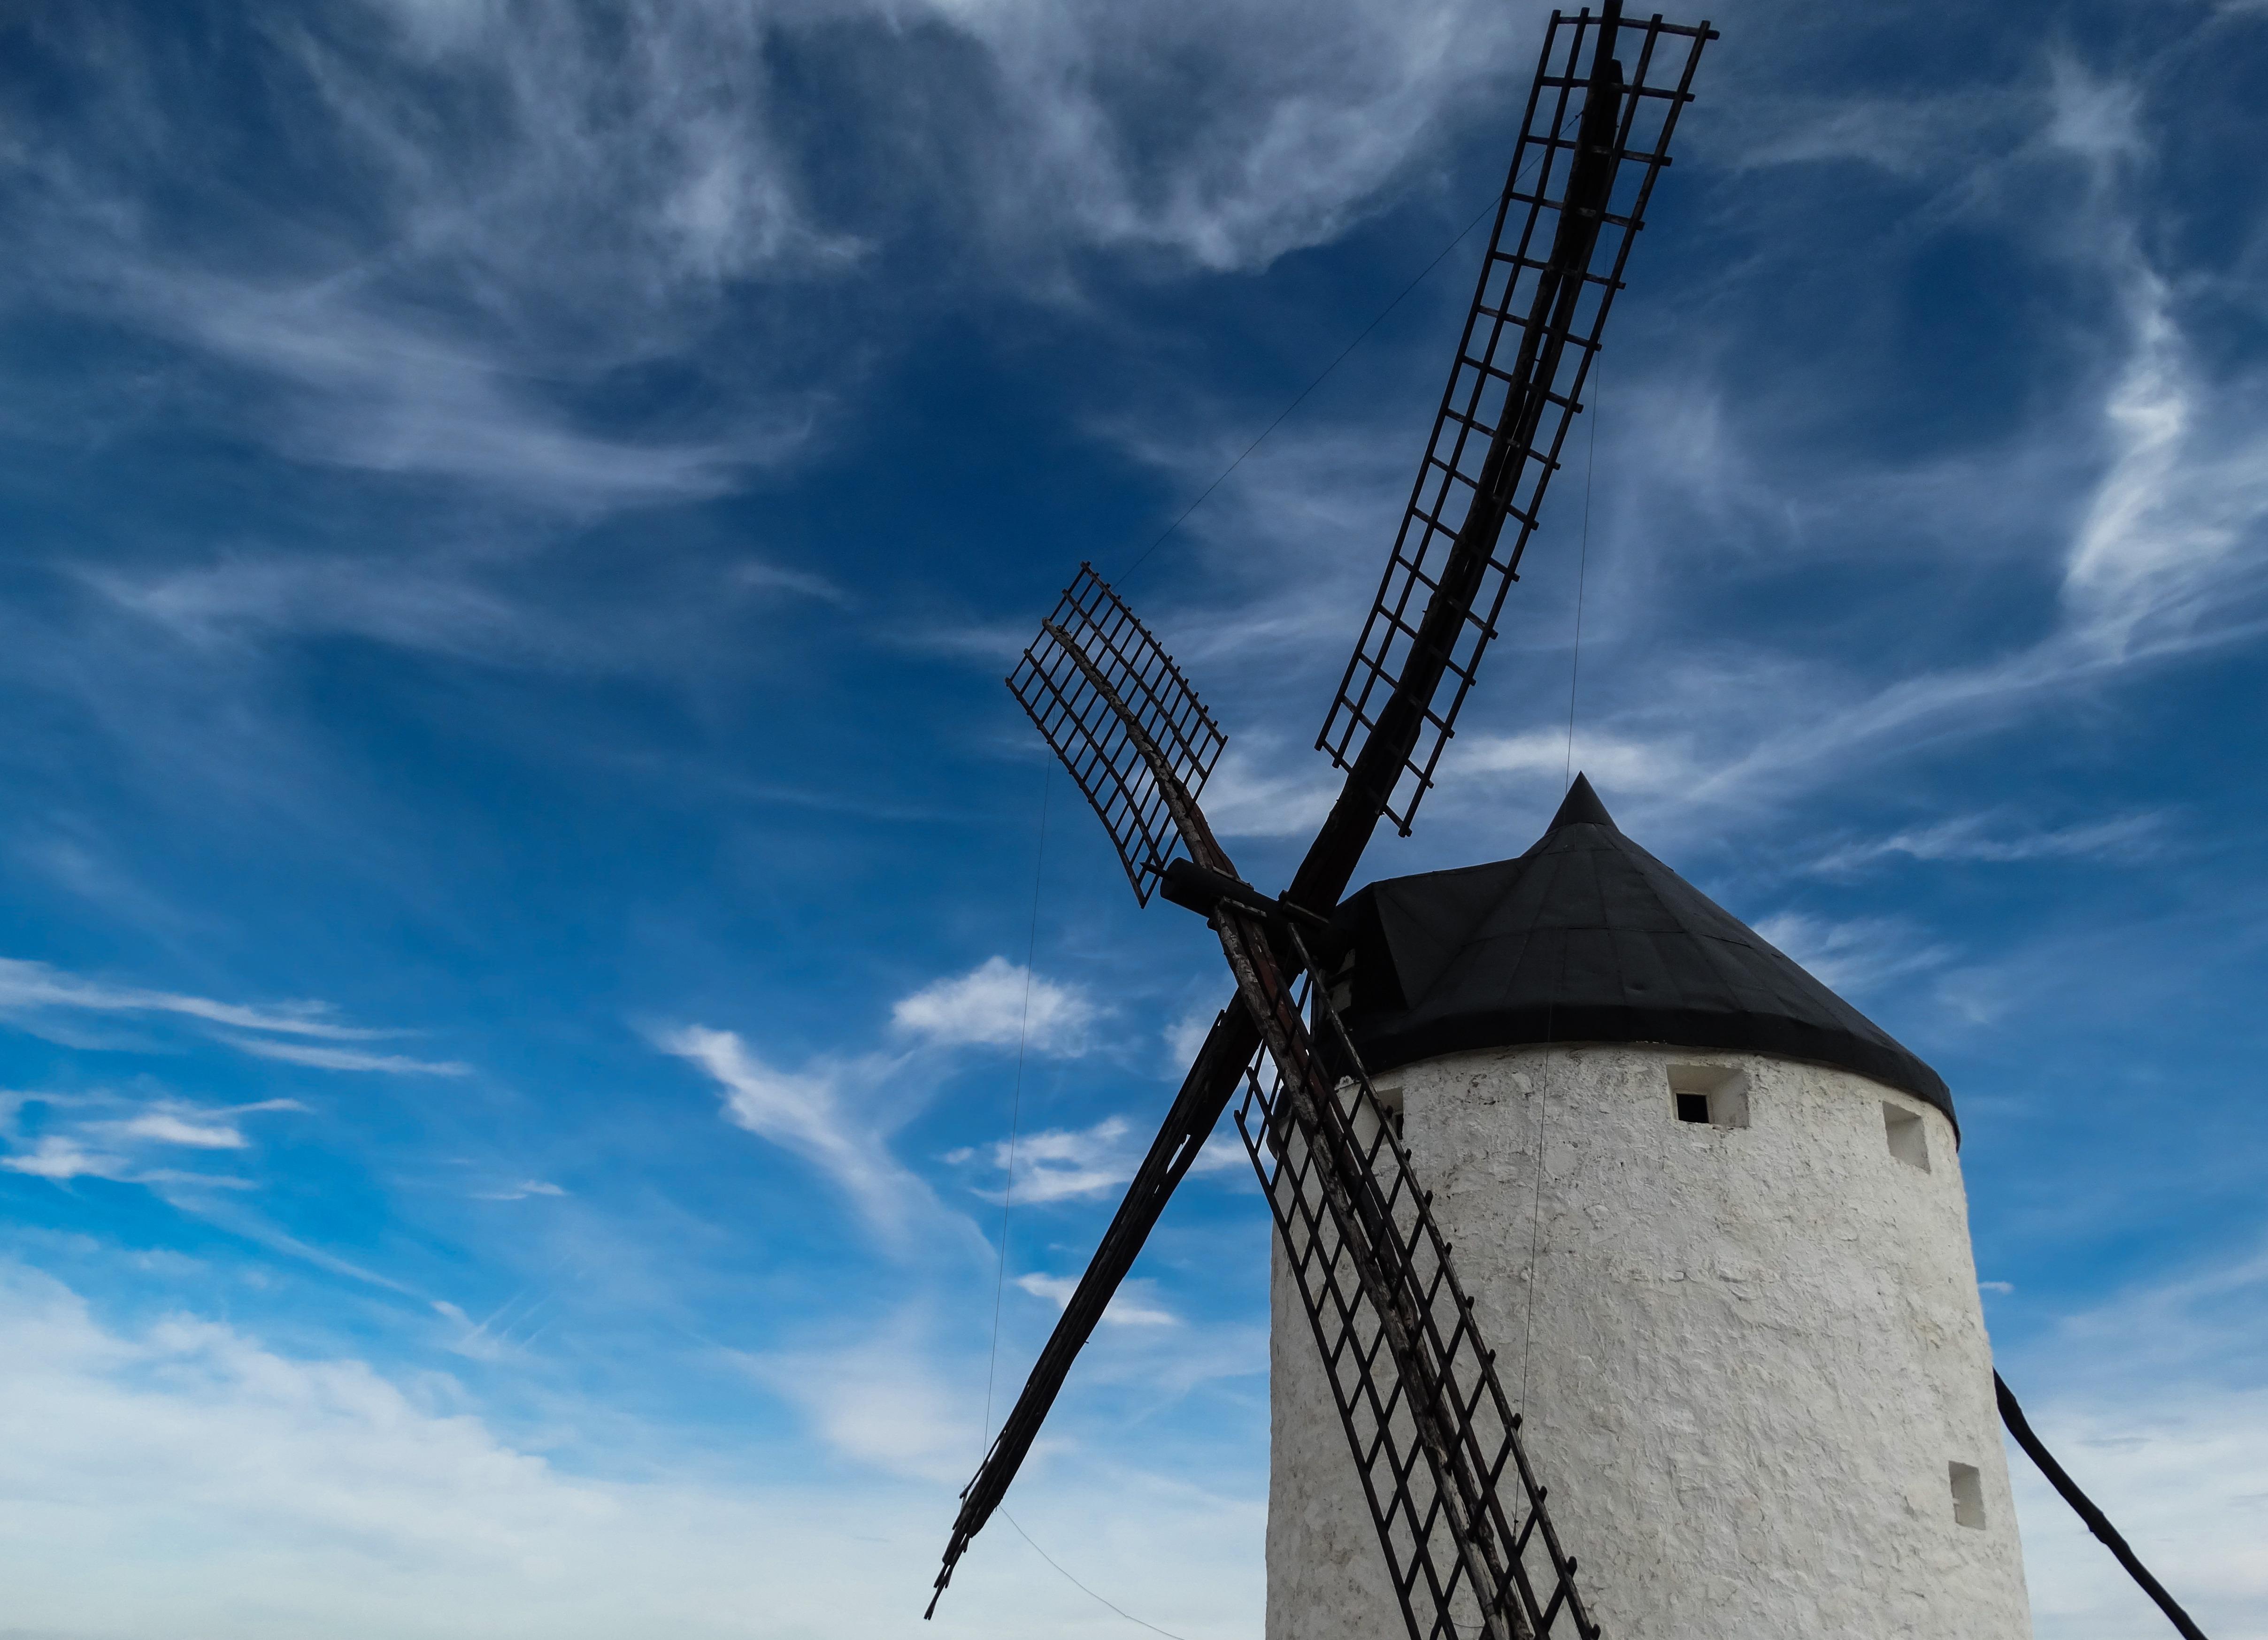 Free Images Landscape Cloud Sky Sunset Windmill